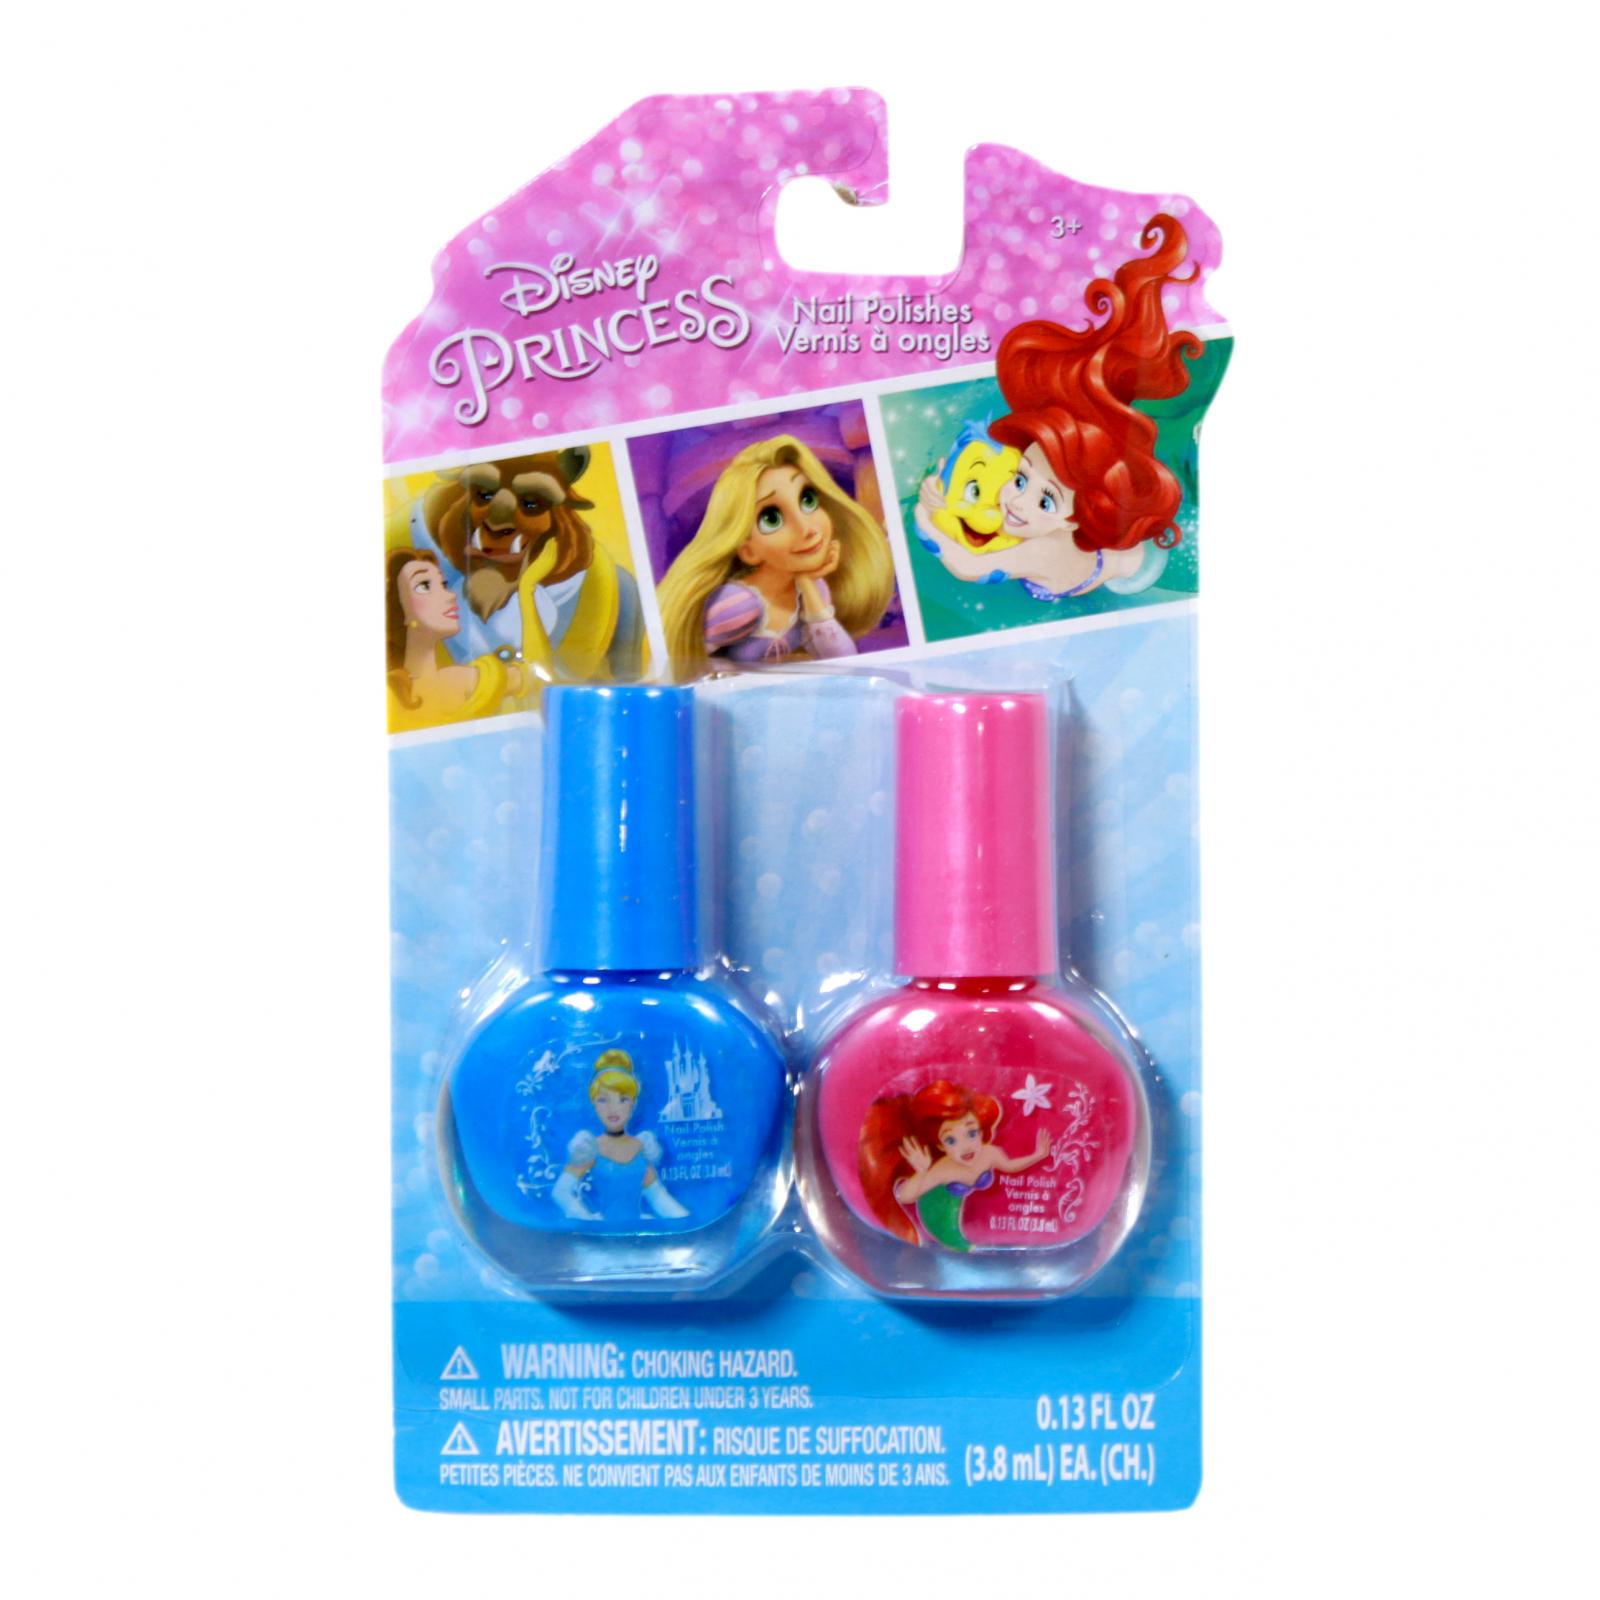 Disney Princess Pink and Blue Nail Polish 2 Piece Set